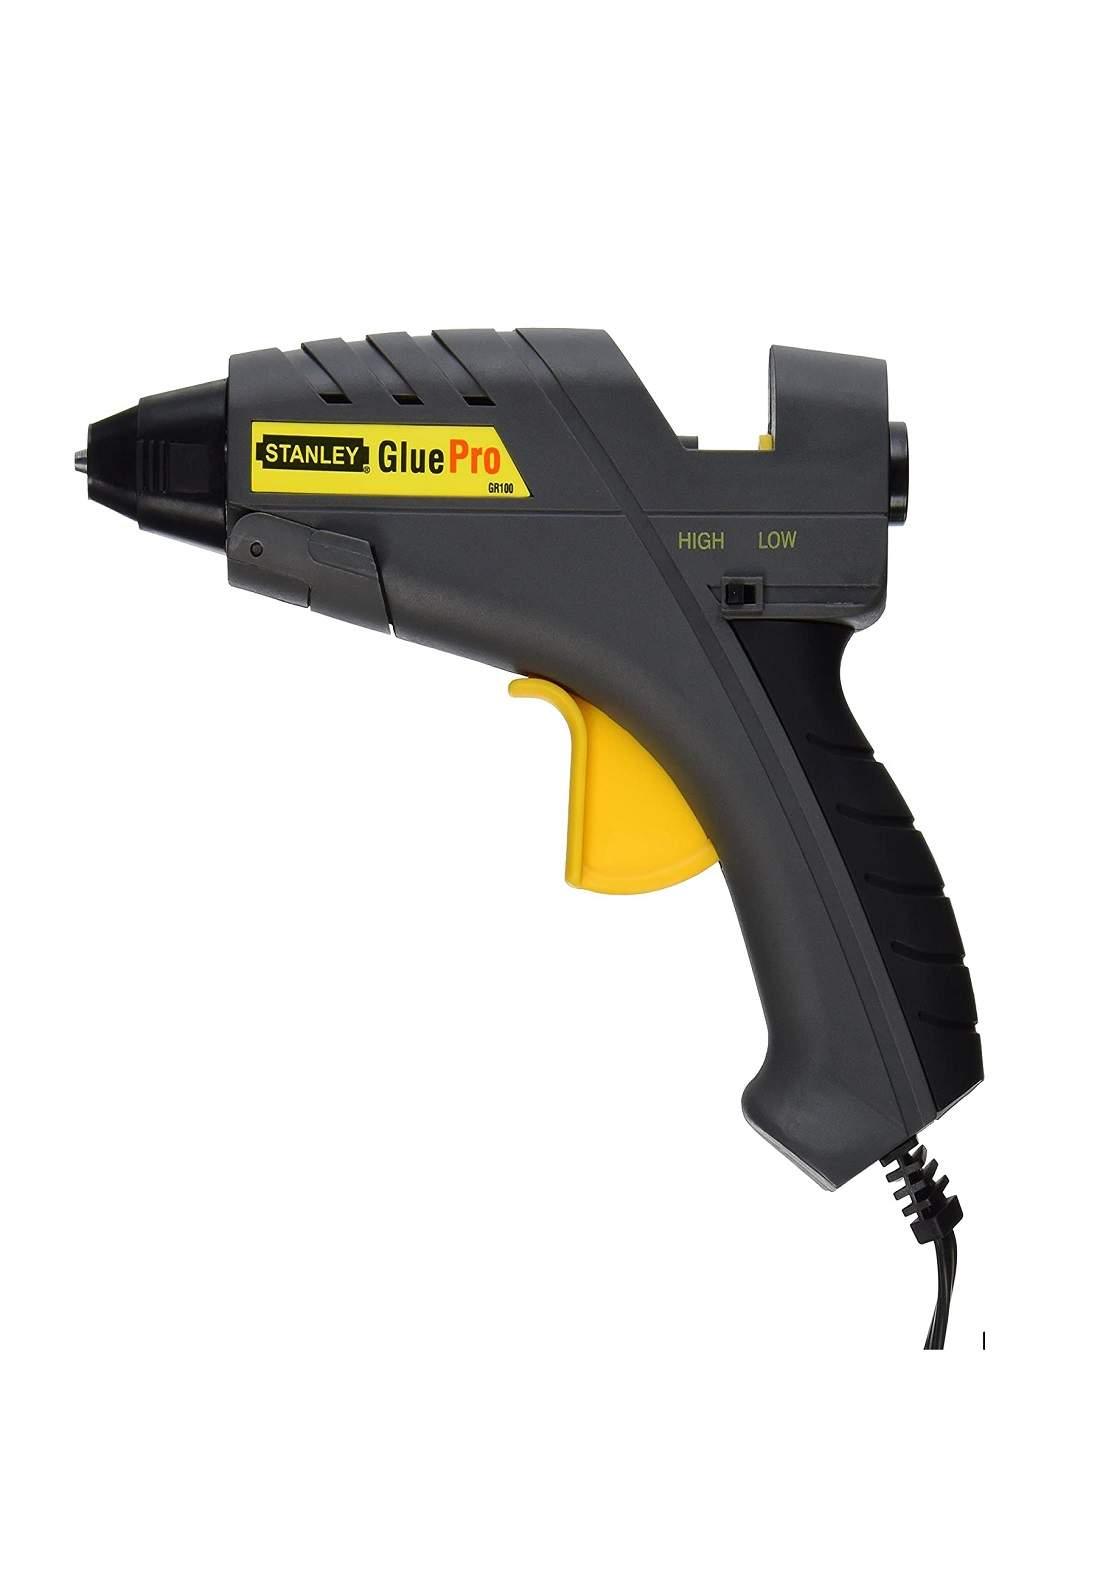 Stanley 0-GR100 Dualmelt Pro™ Glue Gun Kit 80 W مسدس سيليكون